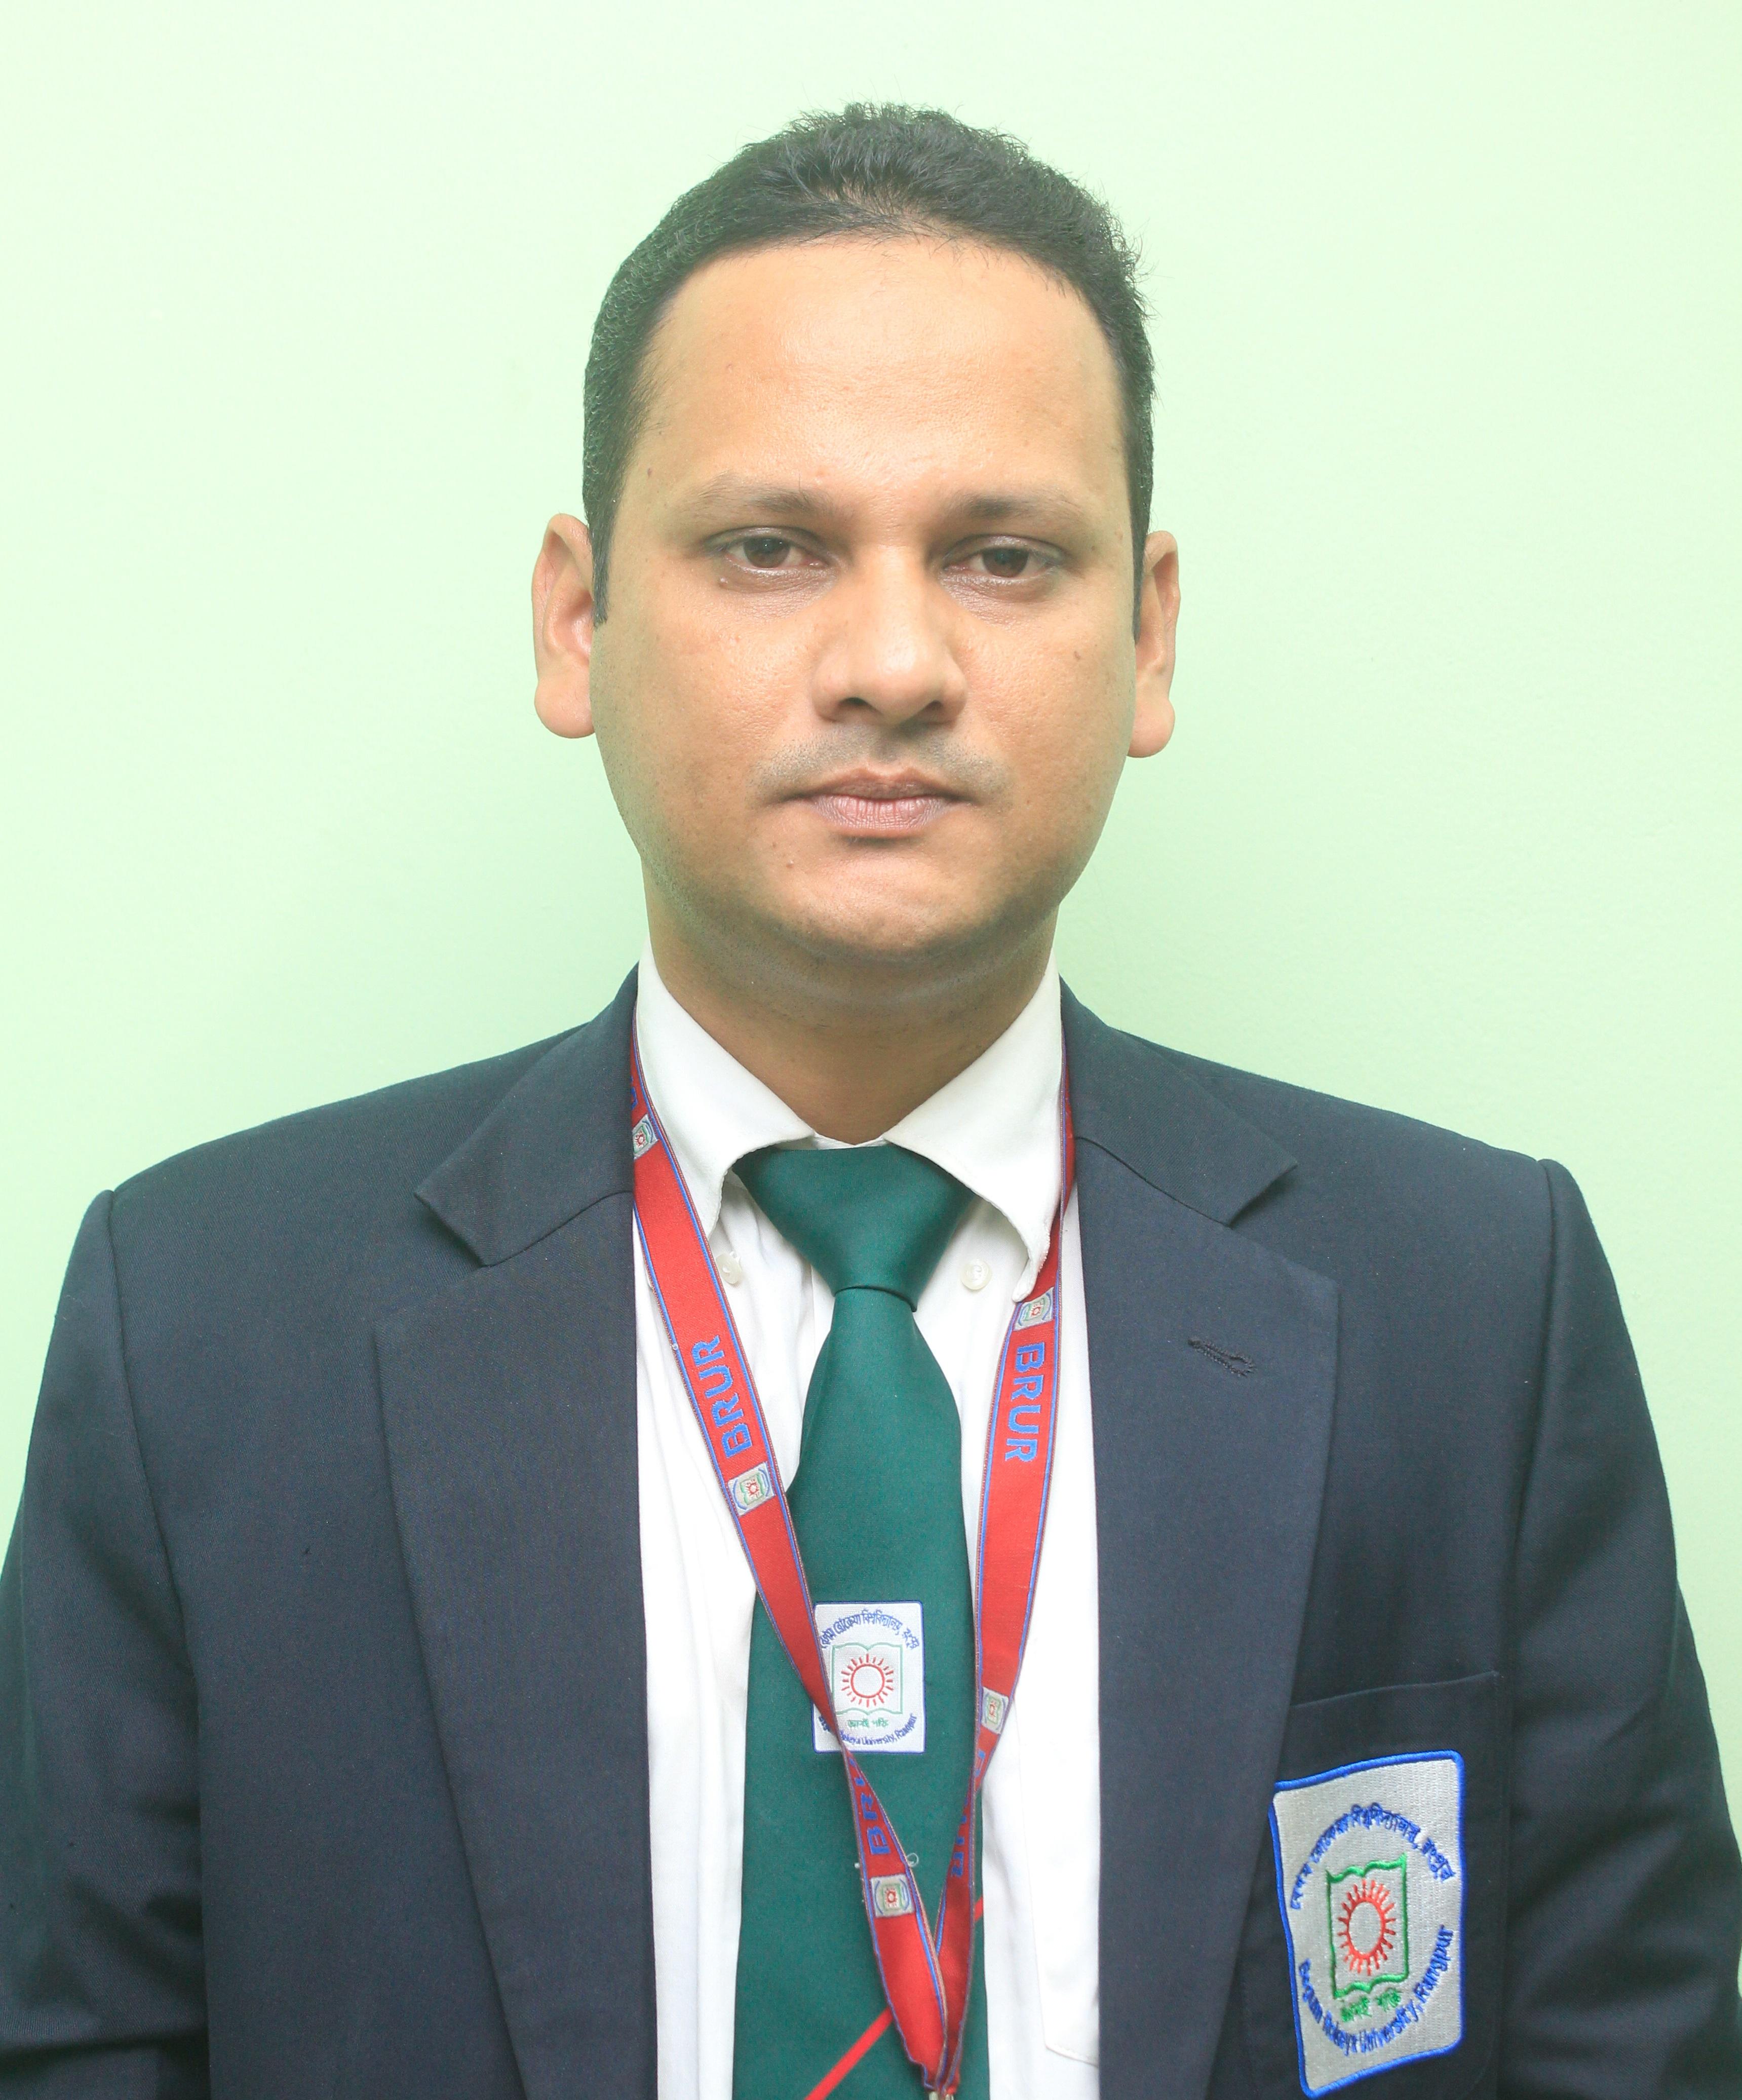 Md. Ehteramul Huq